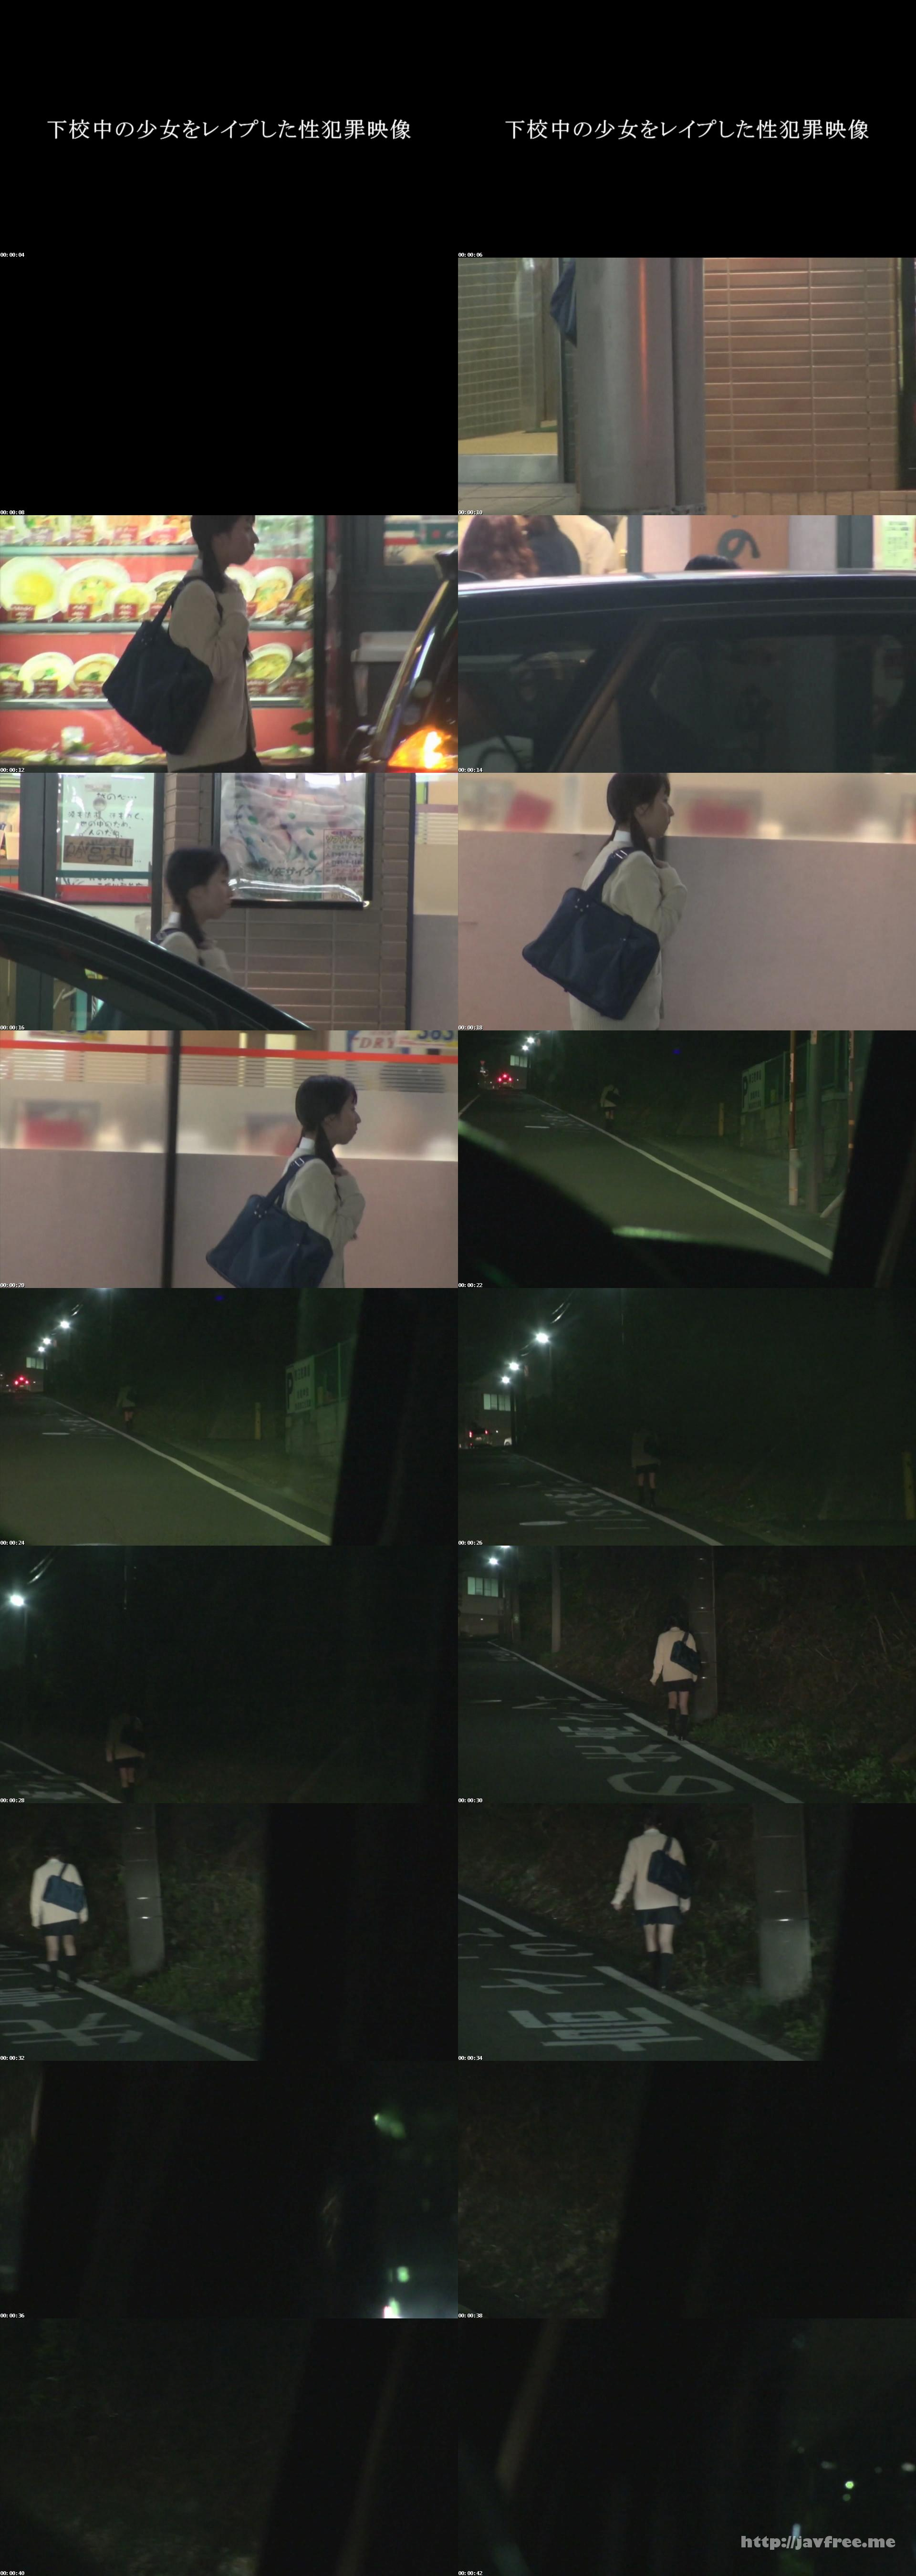 [TUE-051] 下校中の少女を盗撮した性犯罪映像